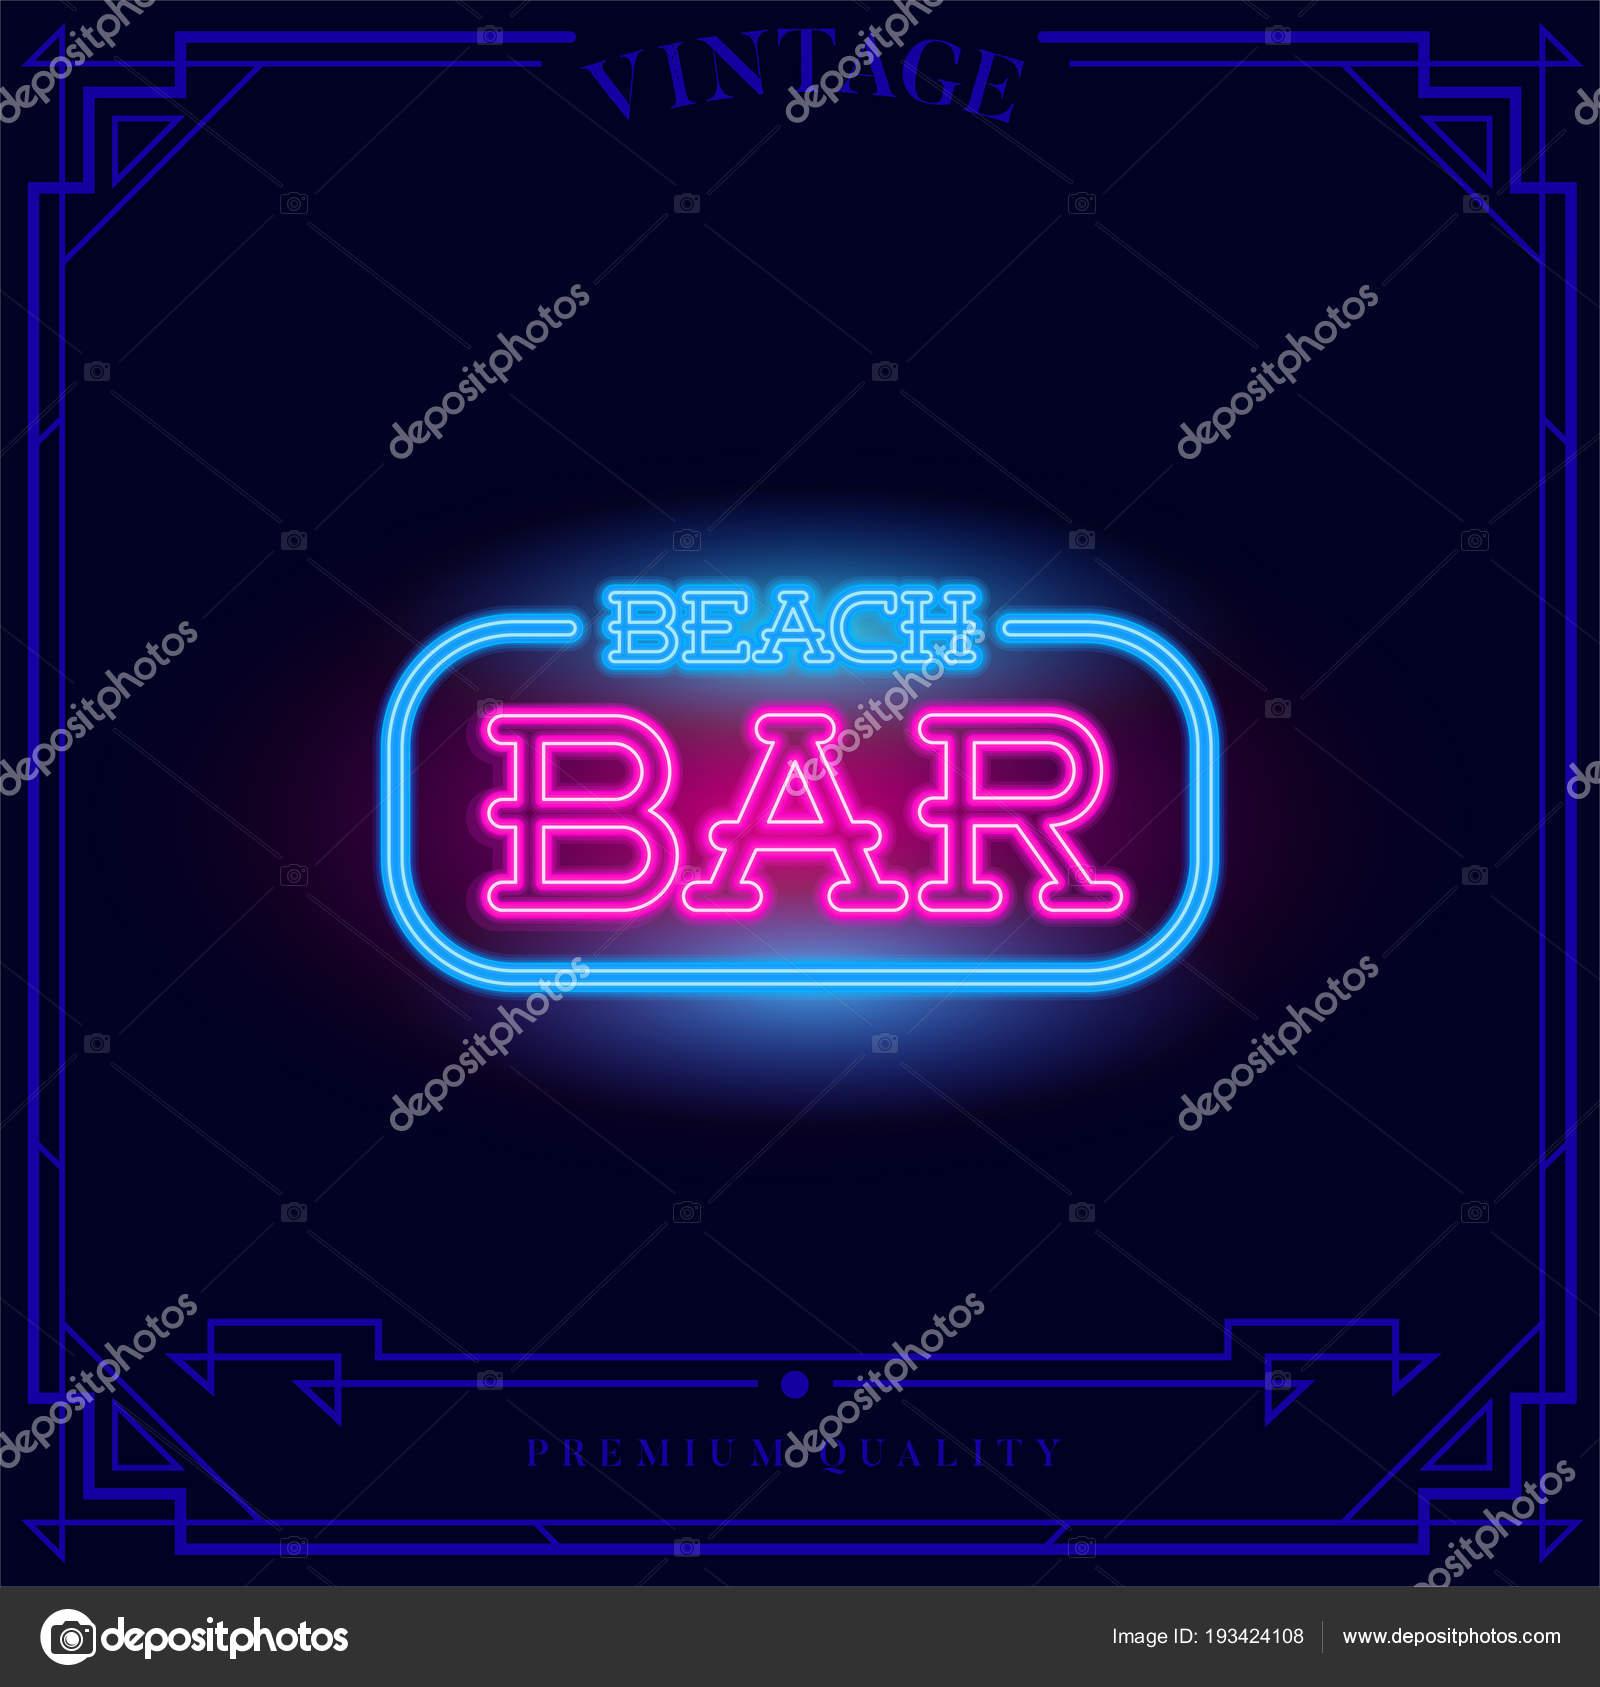 Beach bar neon light sign vector illustration stock vector ckybe beach bar neon light sign vector illustration stock vector mozeypictures Choice Image